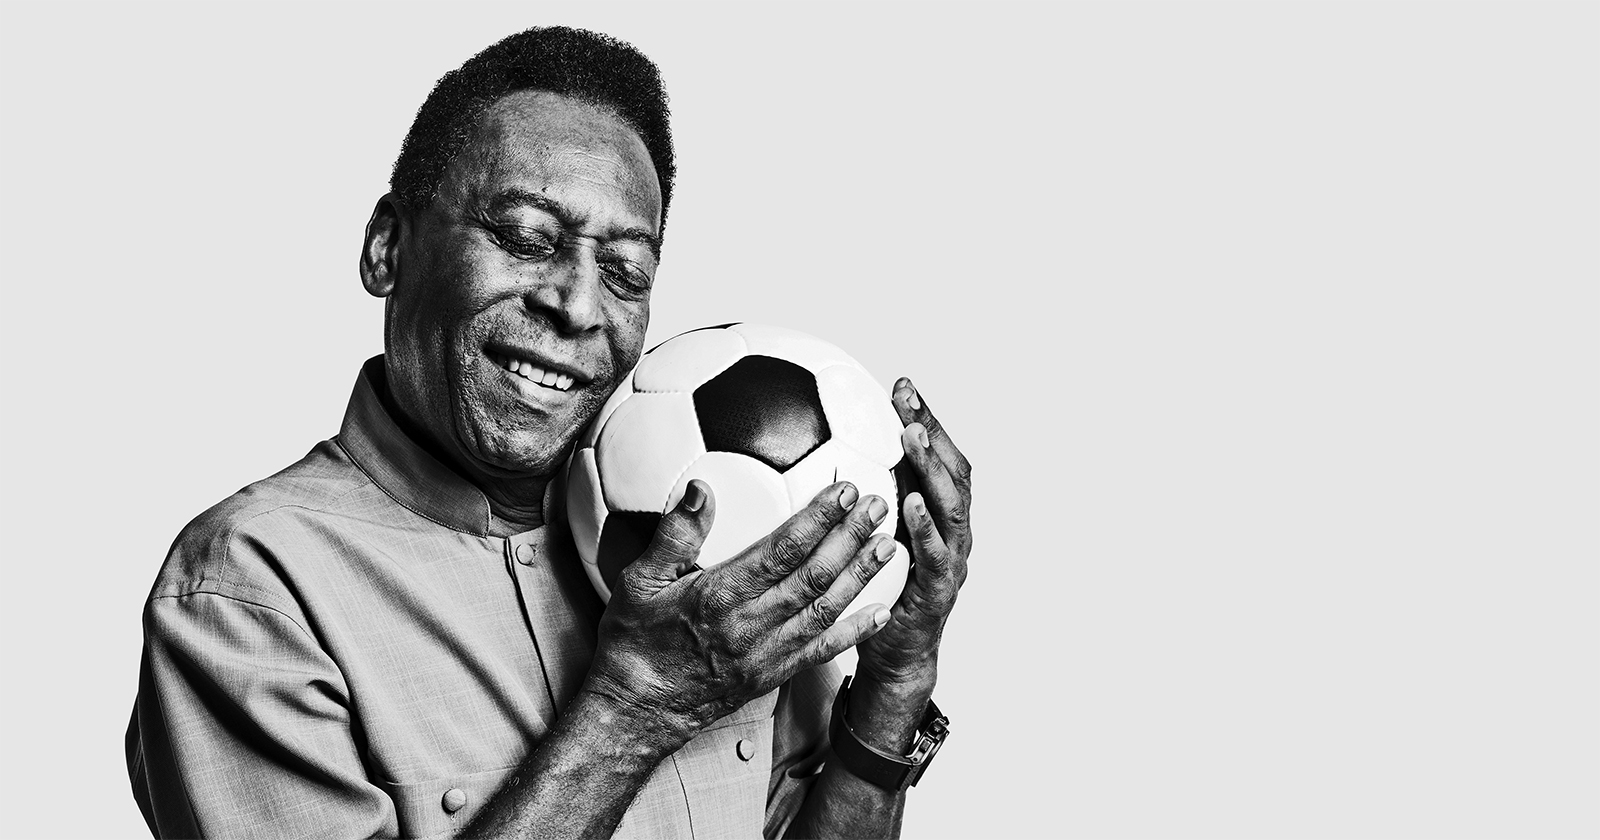 Soccer star Pelé suing Samsung for $30 million